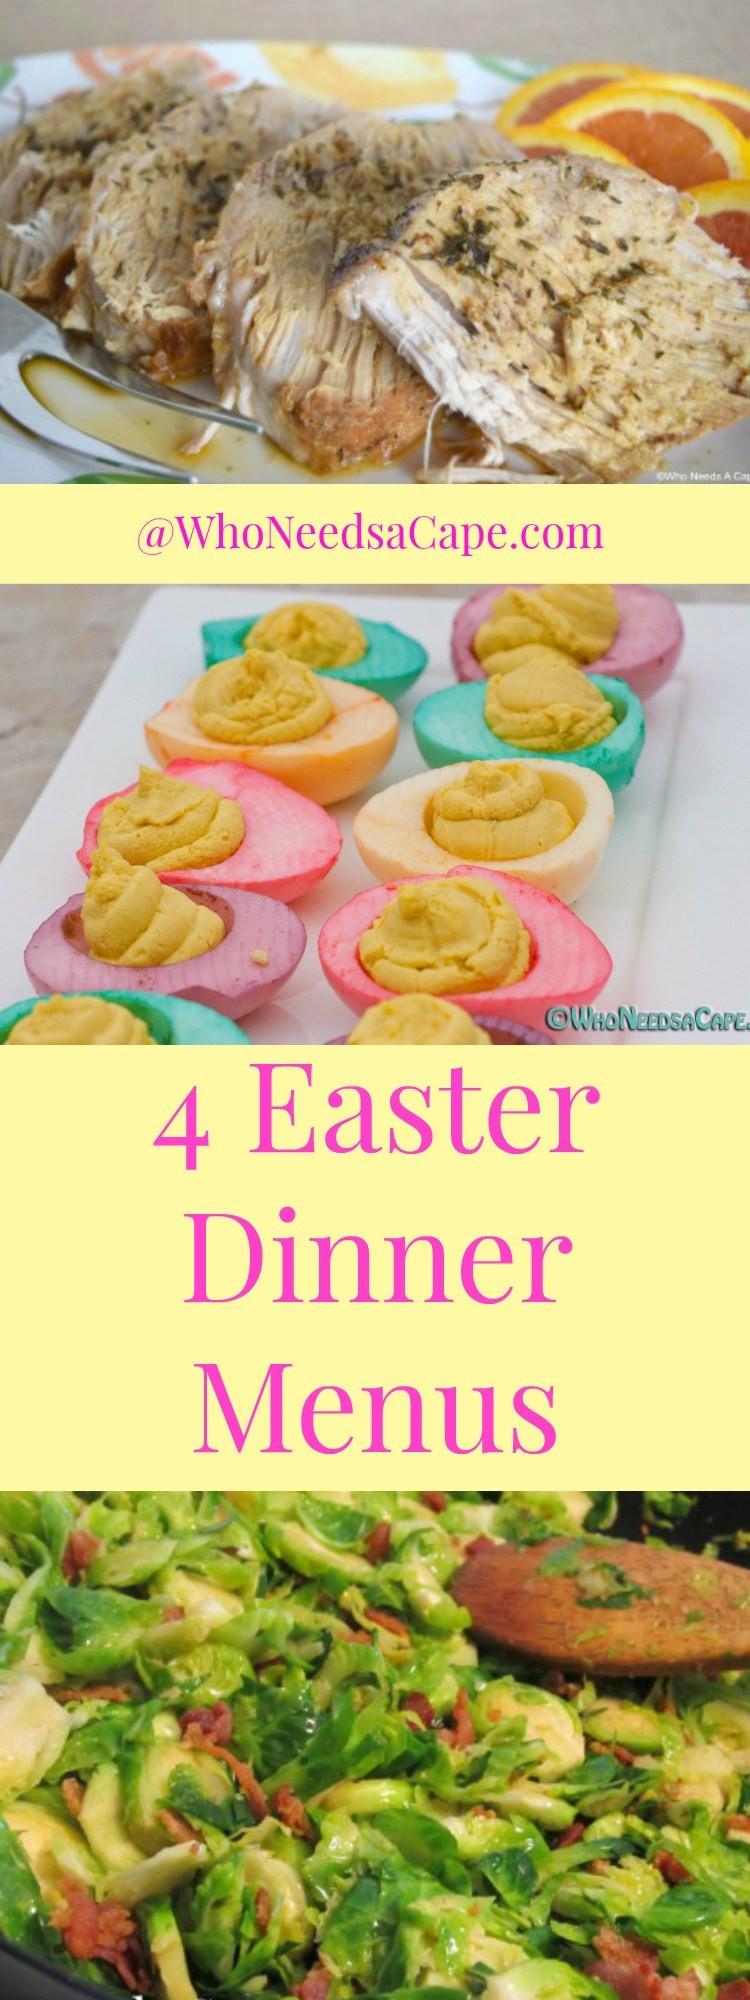 Easter Dinners Menu  Easter Dinner Menus Who Needs A Cape